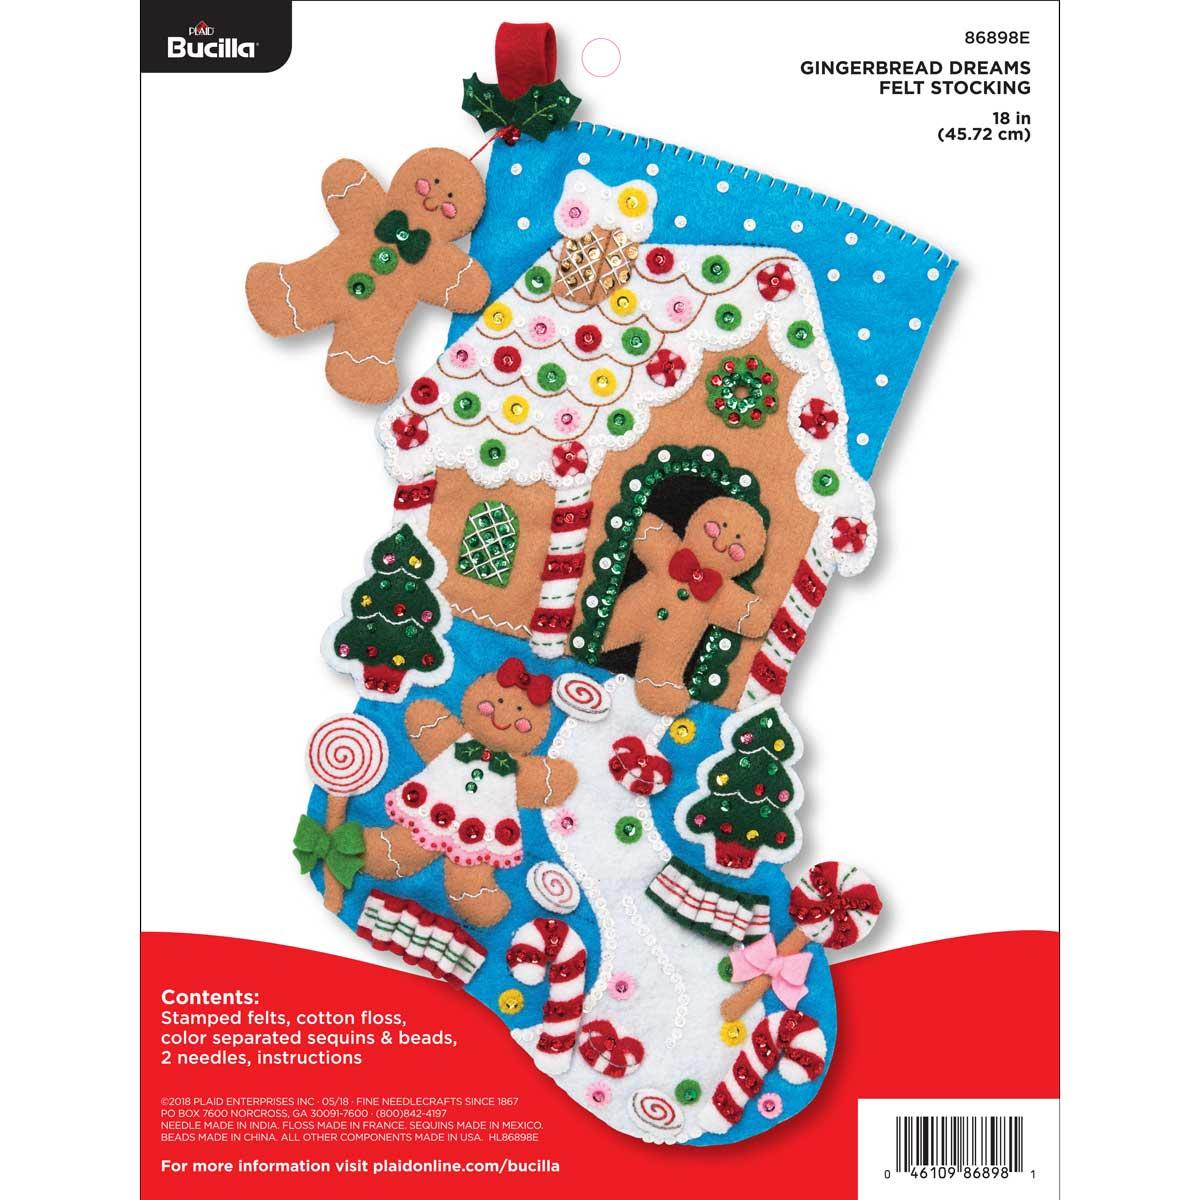 Bucilla ® Seasonal - Felt - Stocking Kits - Gingerbread Dreams